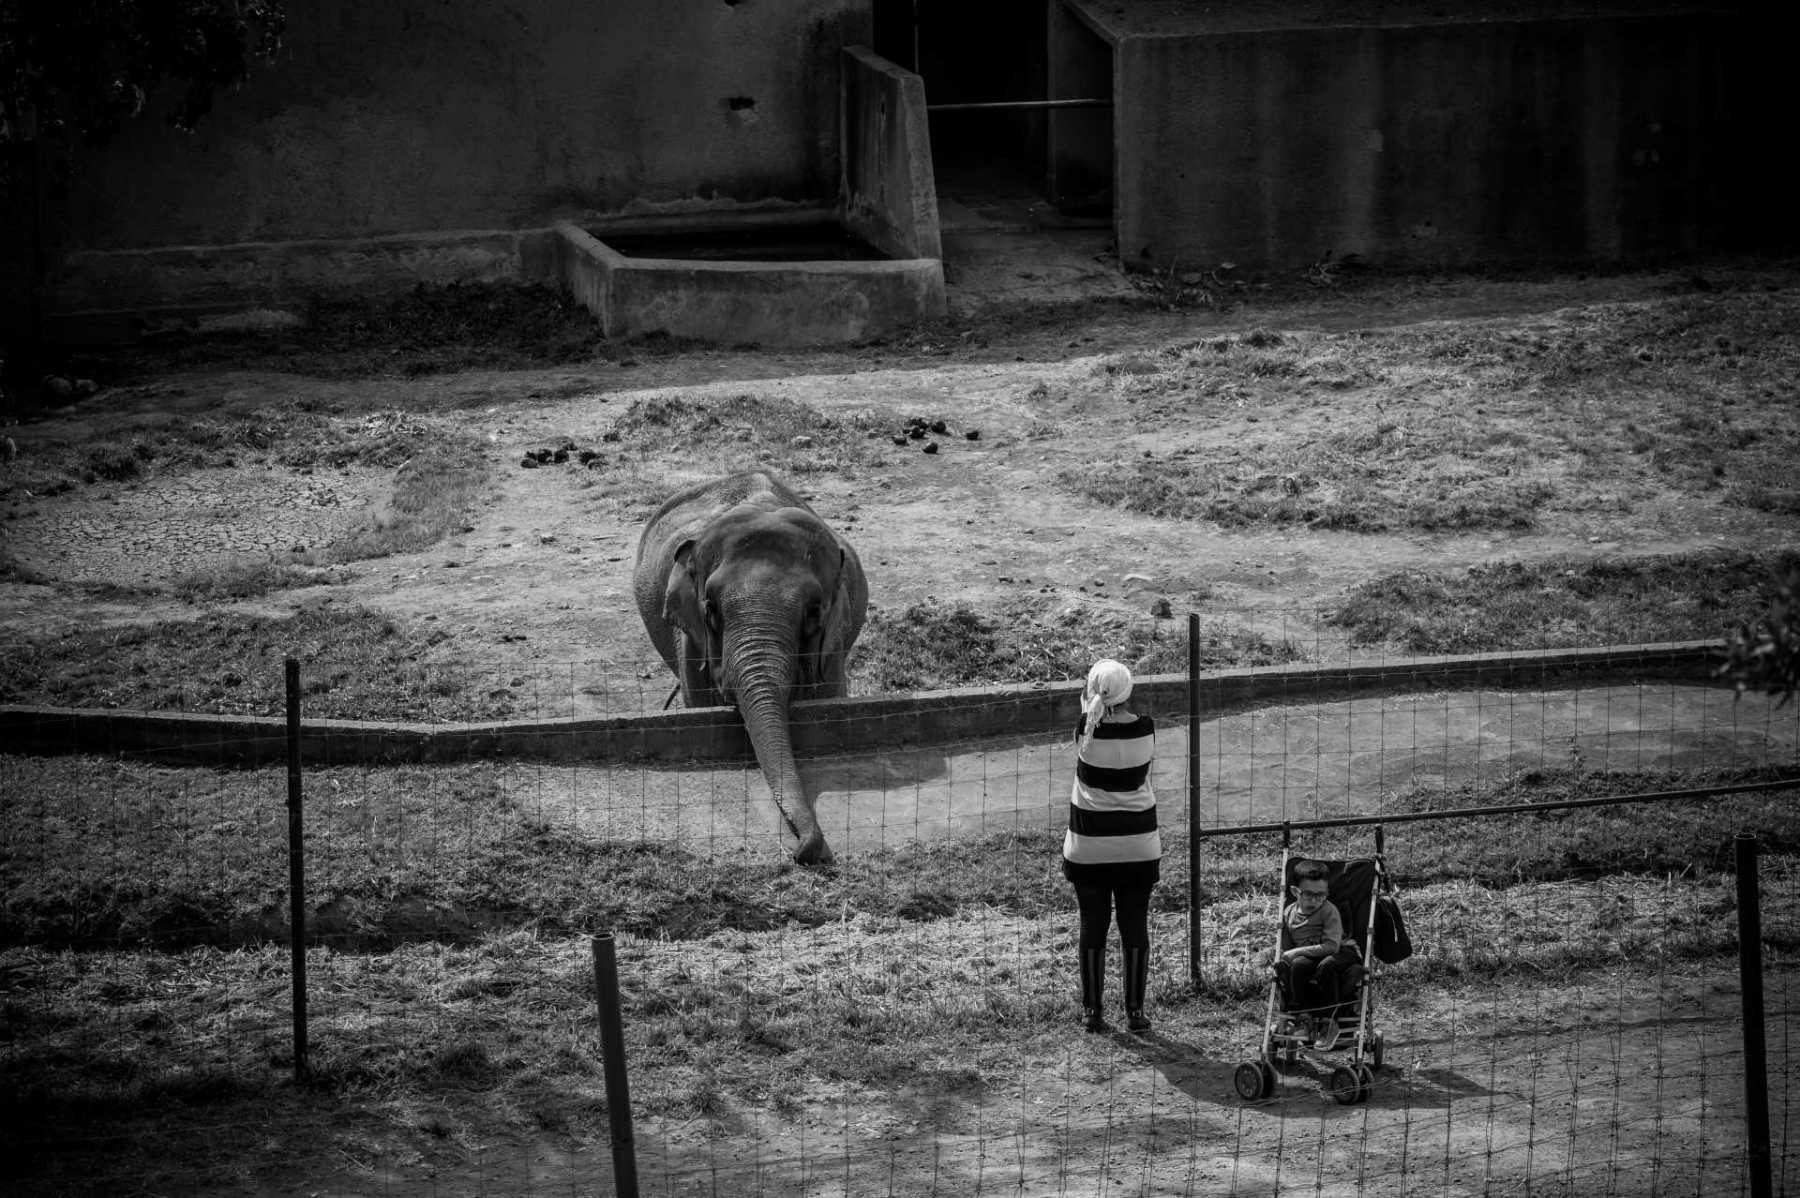 Elephant. France, 2016. JMcArthur / Born Free Foundation